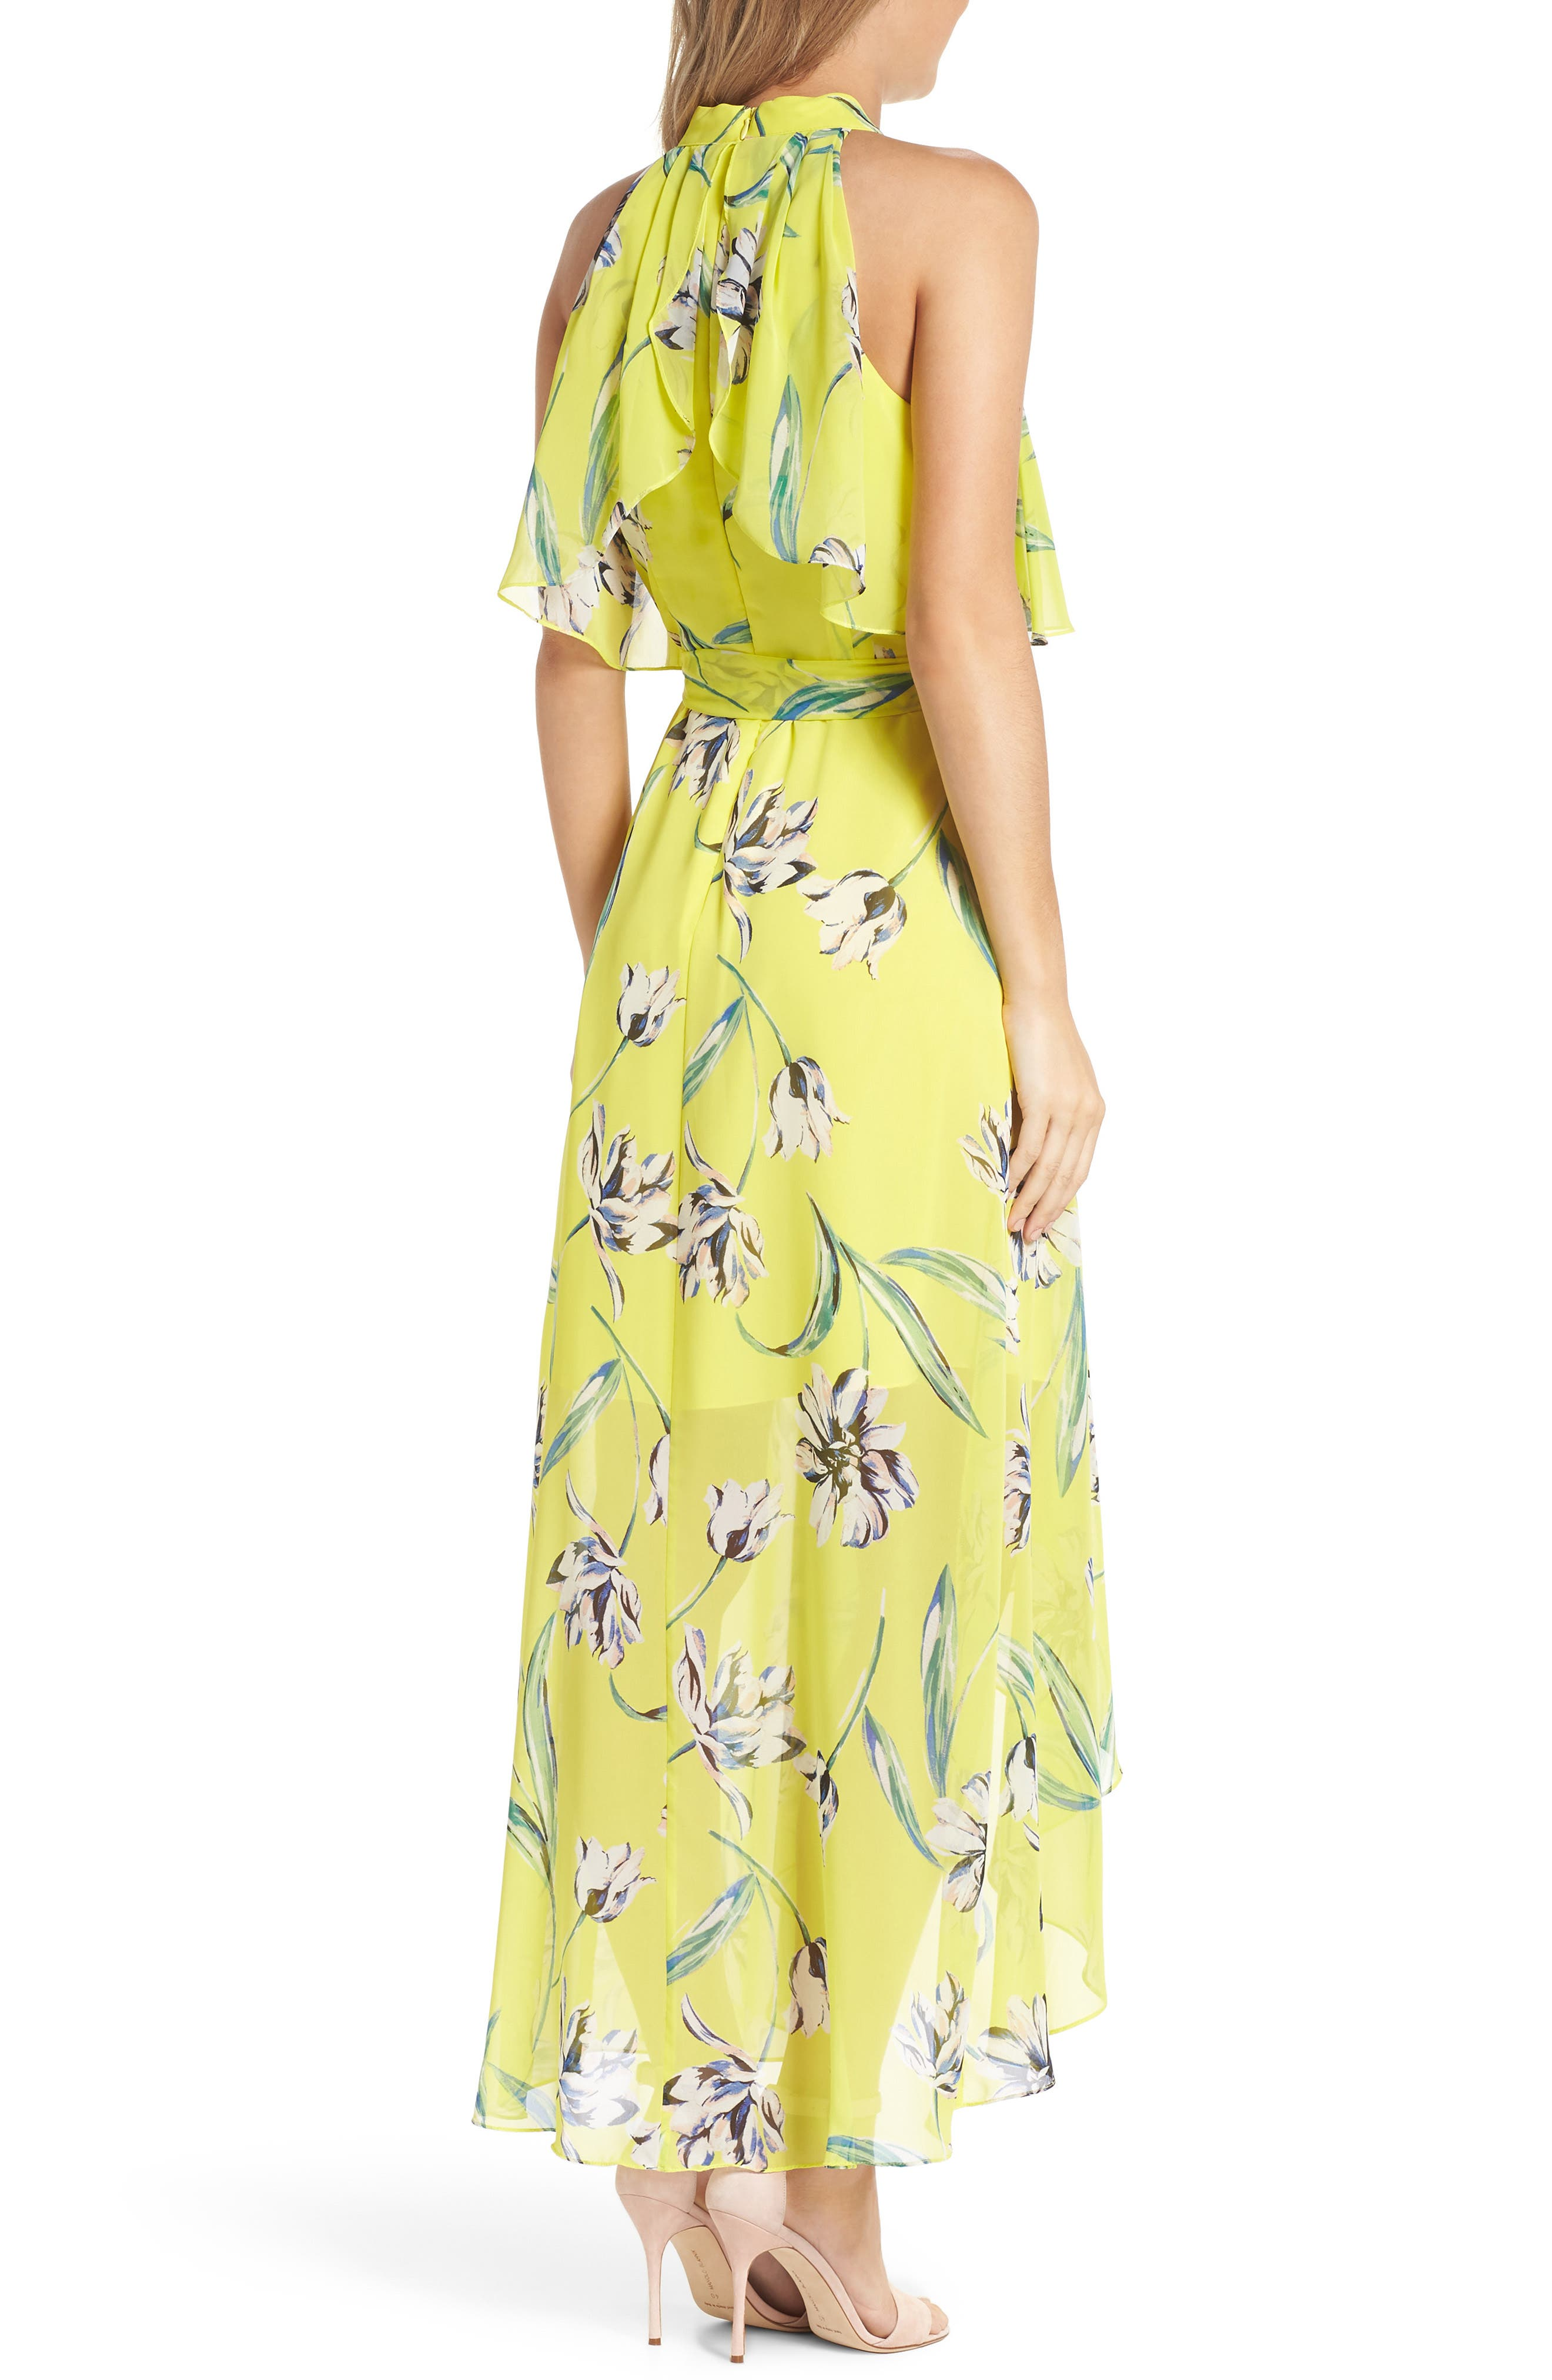 ELIZA J, Halter Neck Chiffon Maxi Dress, Alternate thumbnail 2, color, 720